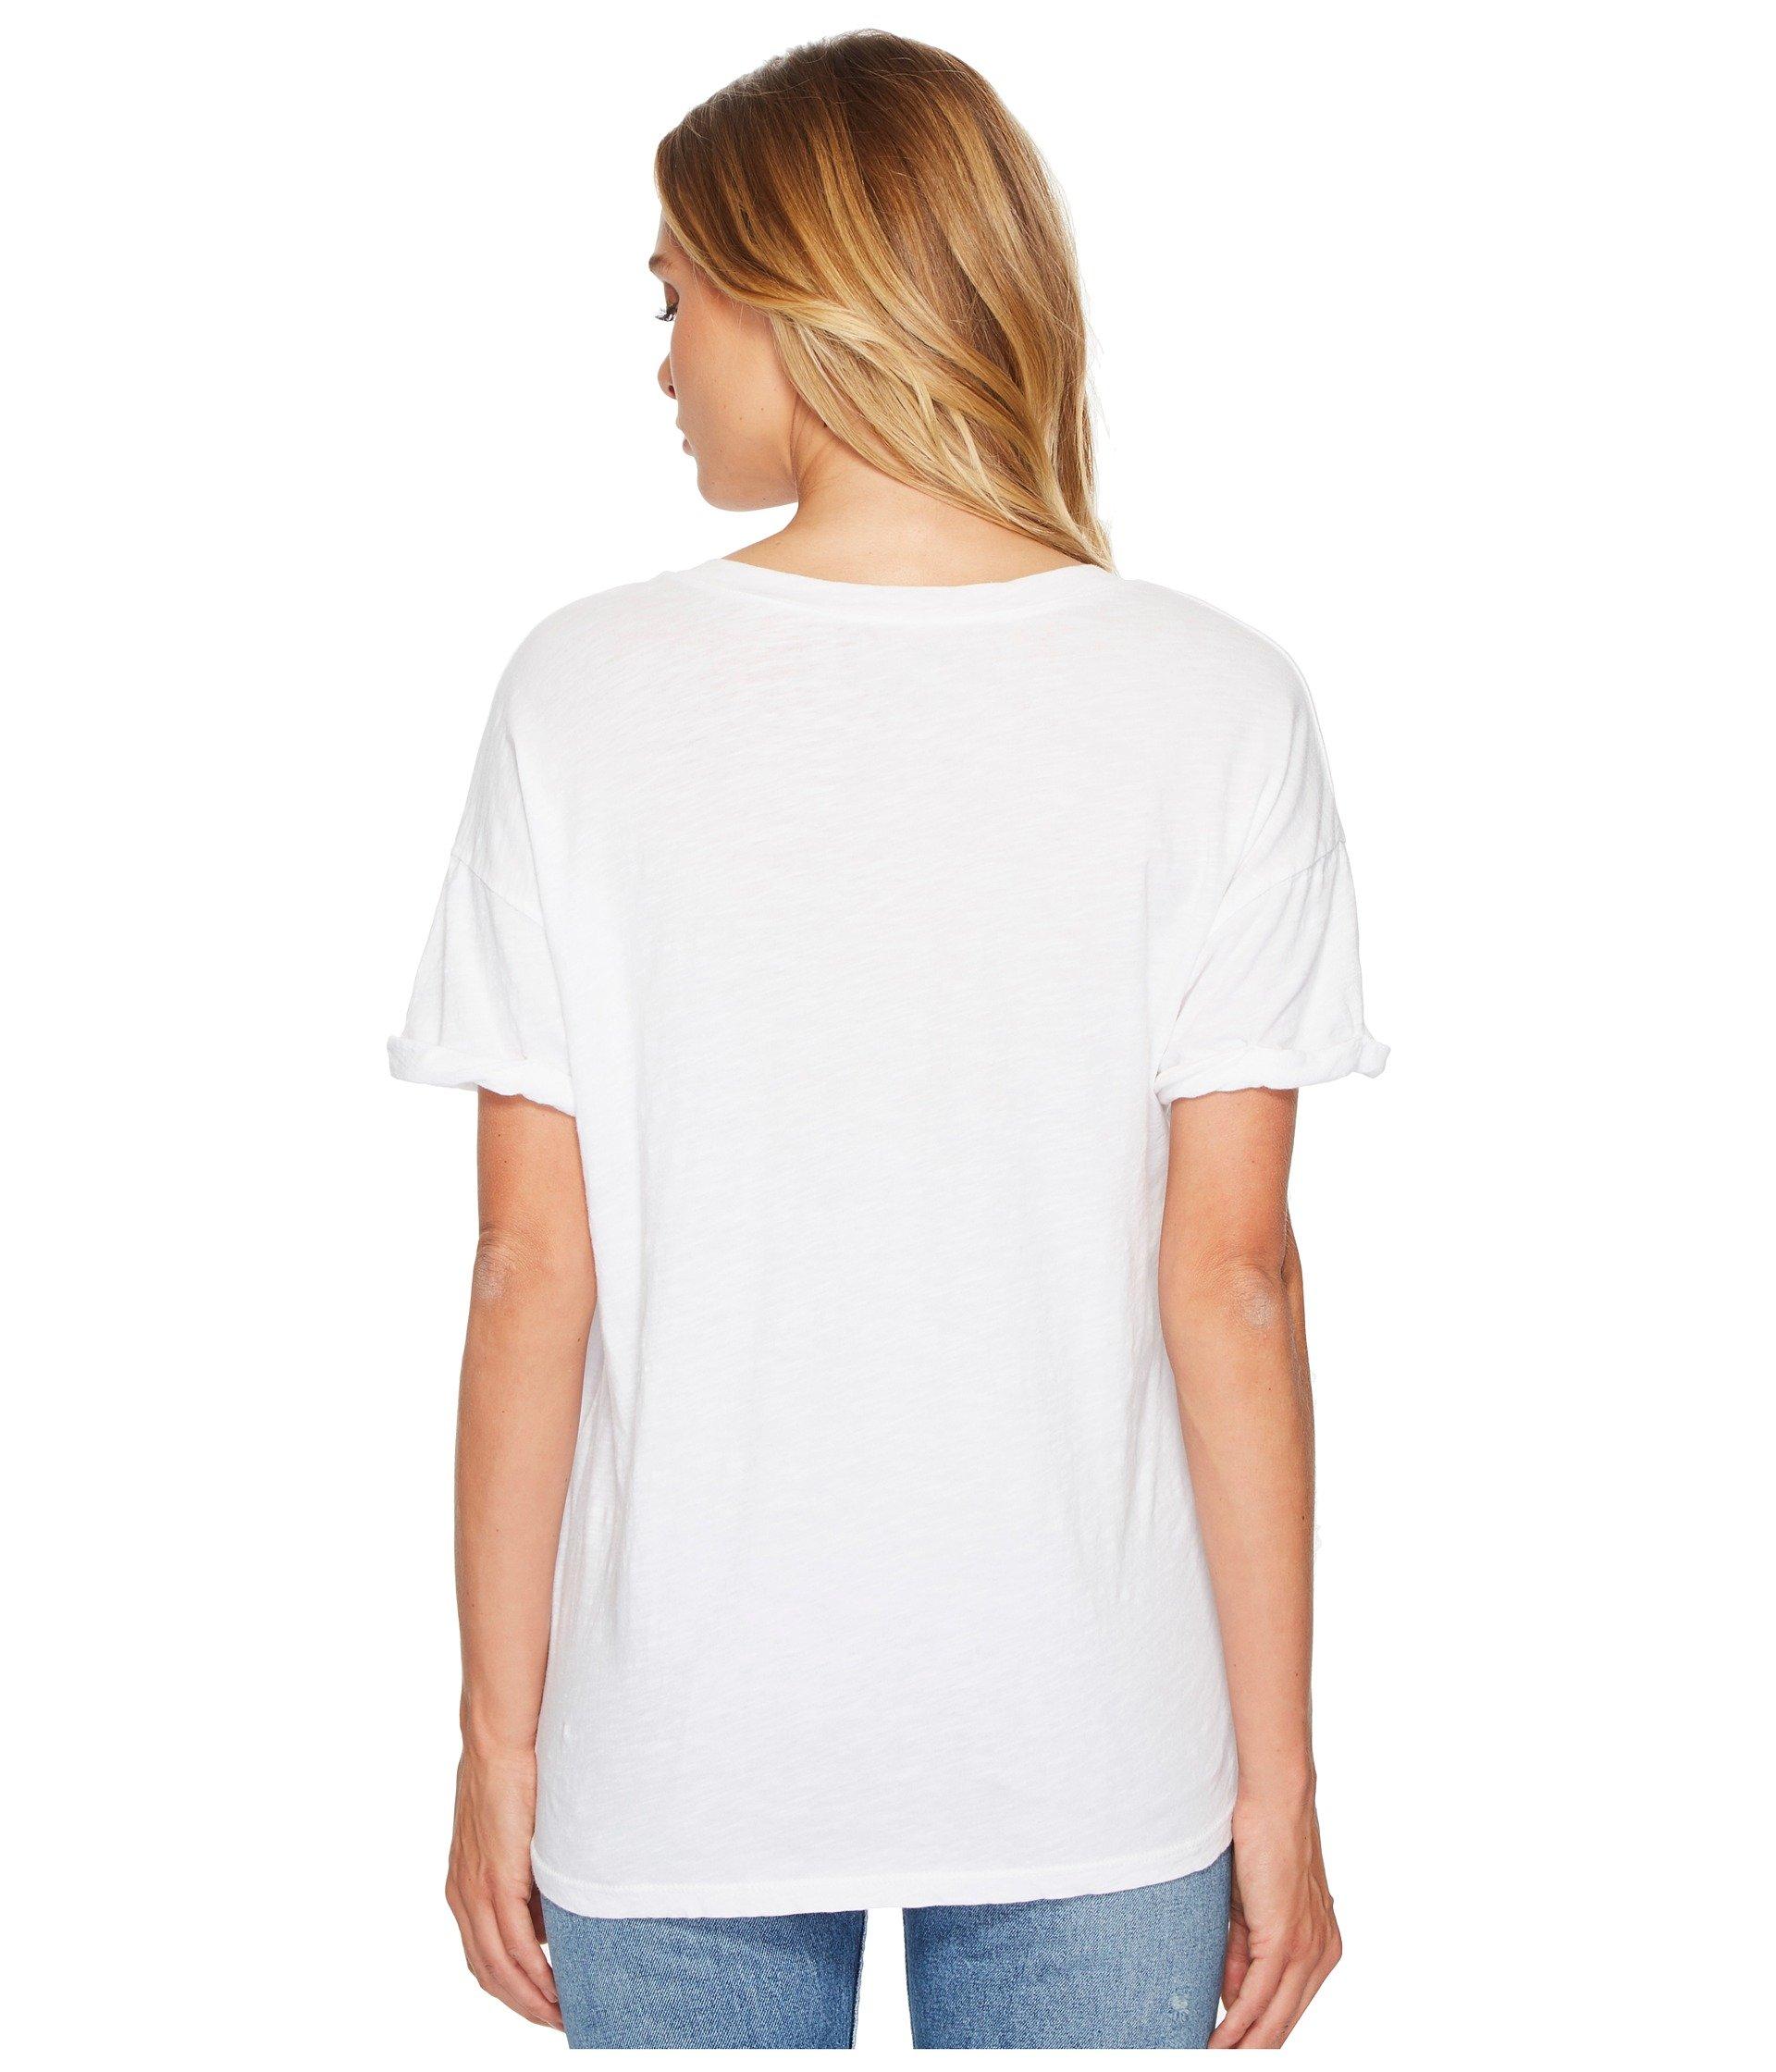 Others White Sleeve T Well W Brand shirt neck Retro Short The Drinks Original V wOYa66q